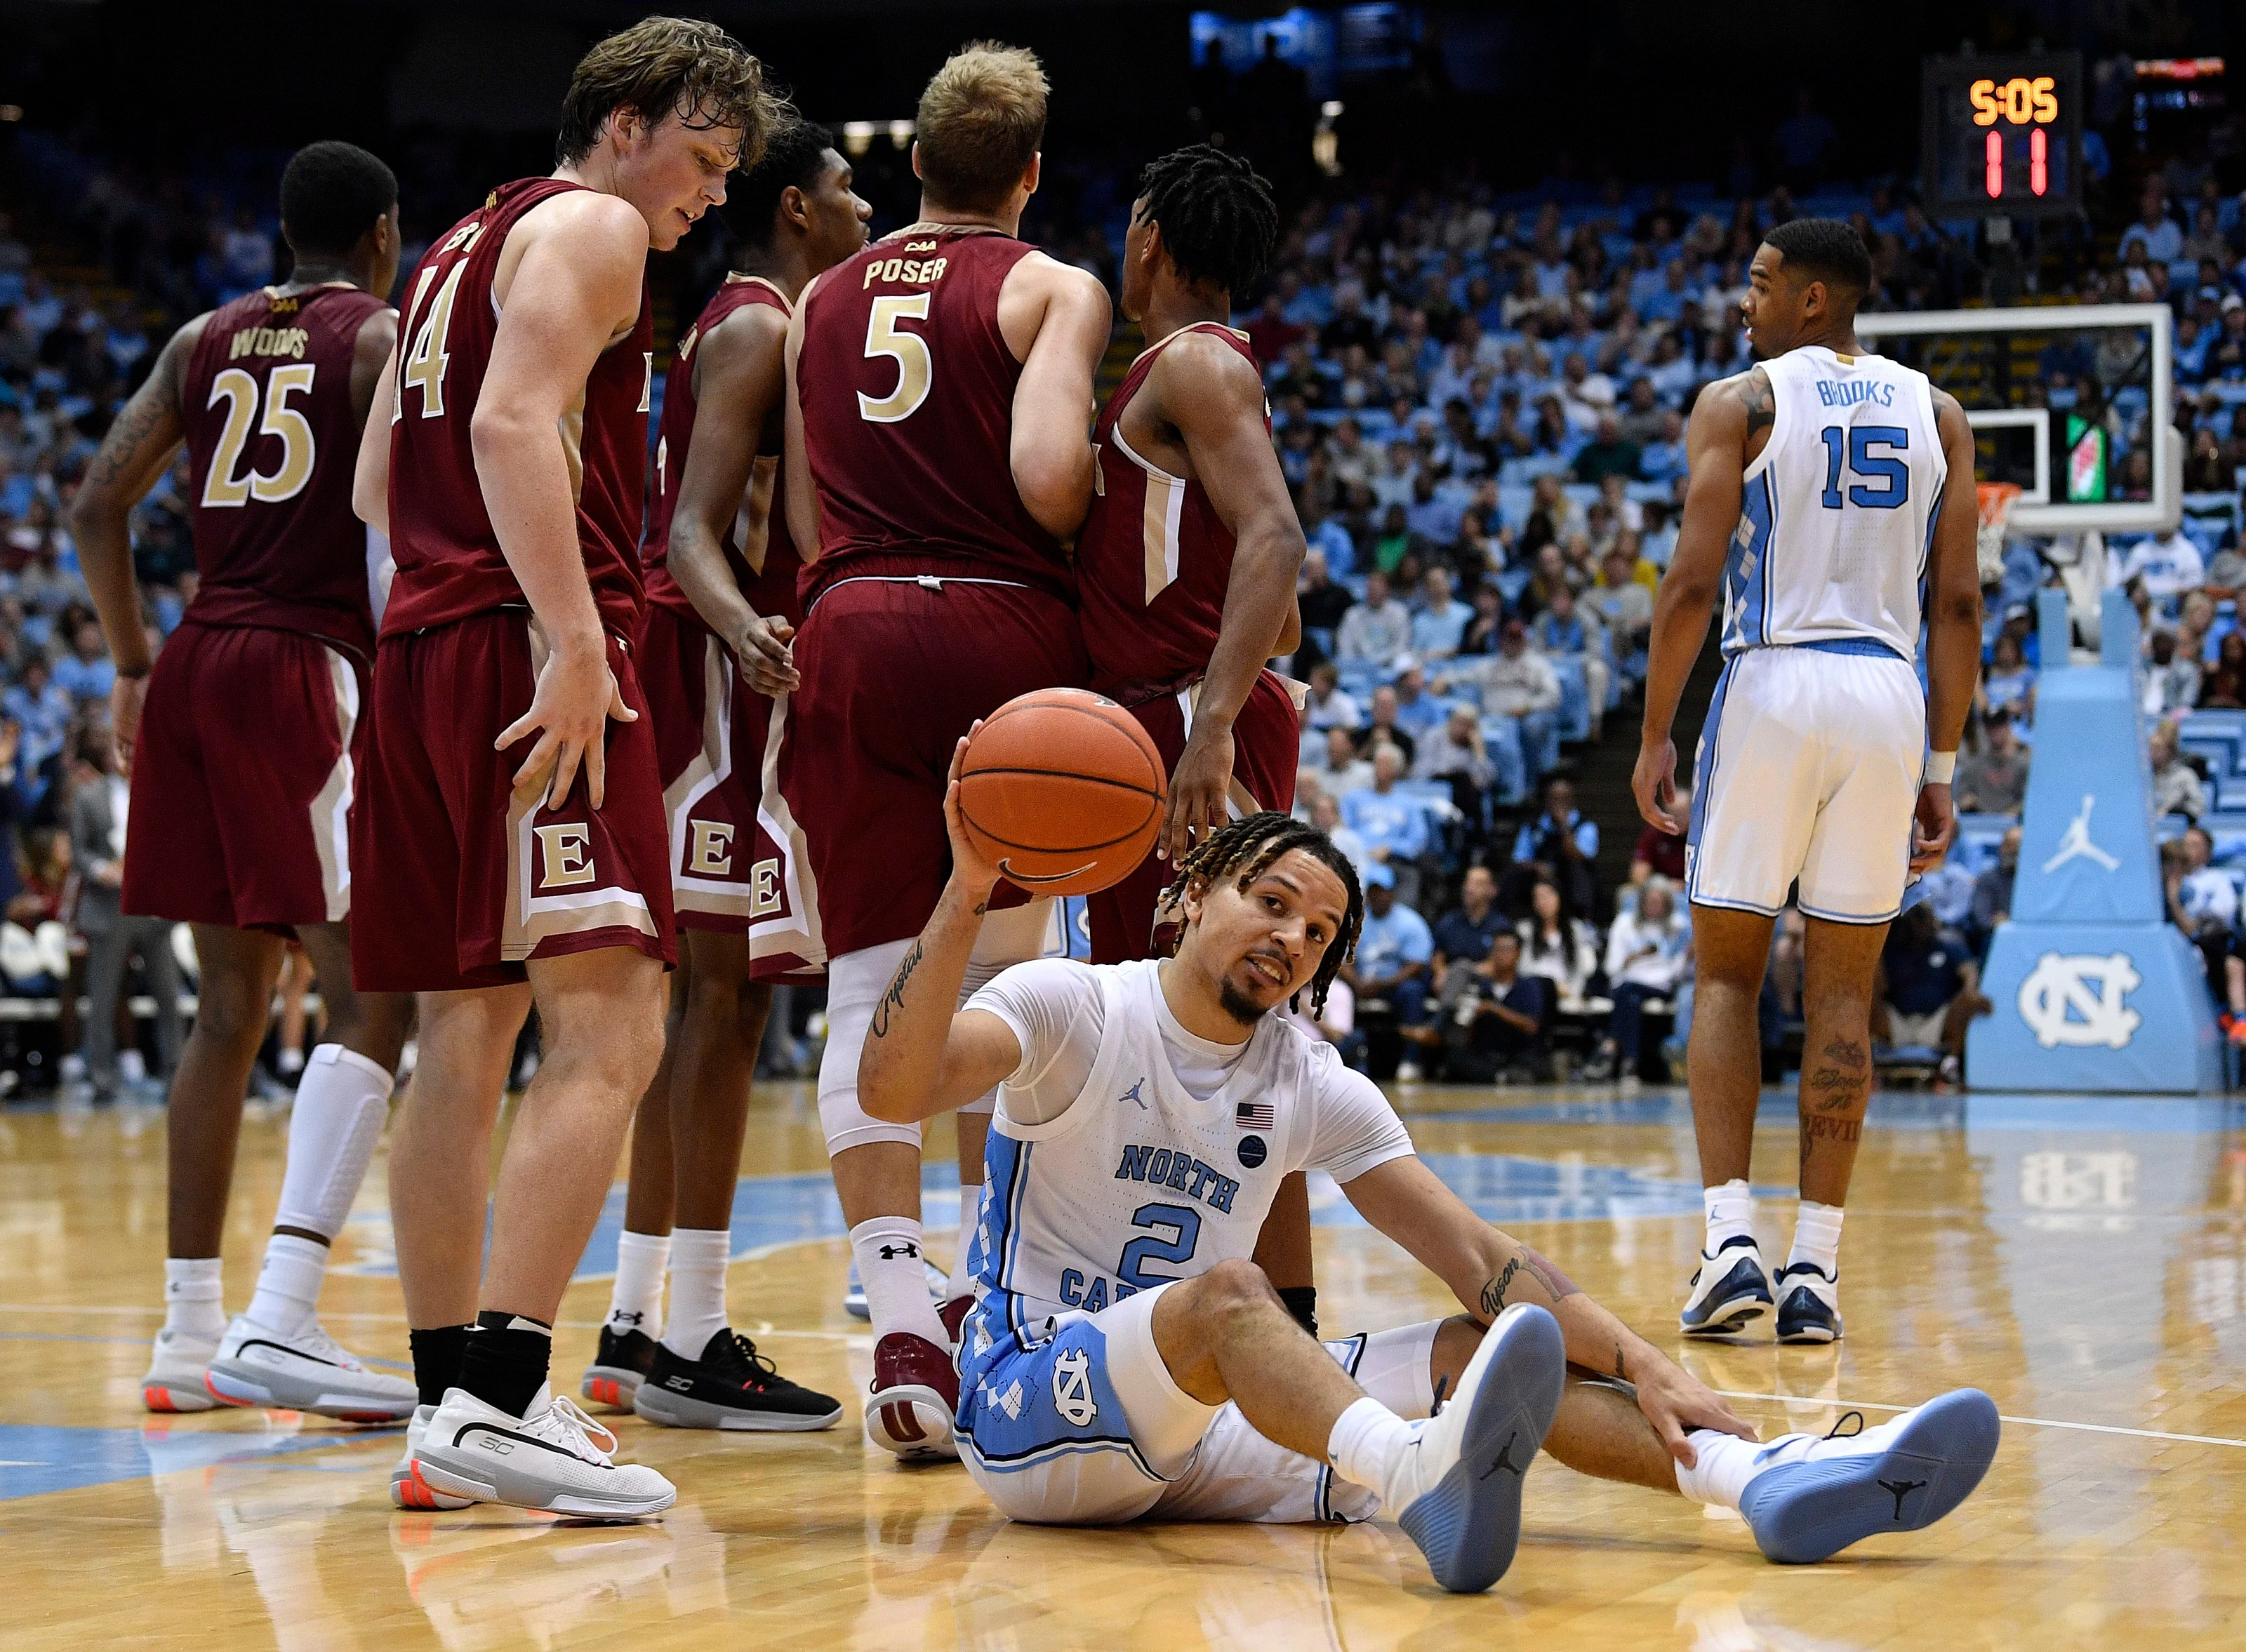 Ncaa Basketball Major Flaws For Unc Virginia Amp More